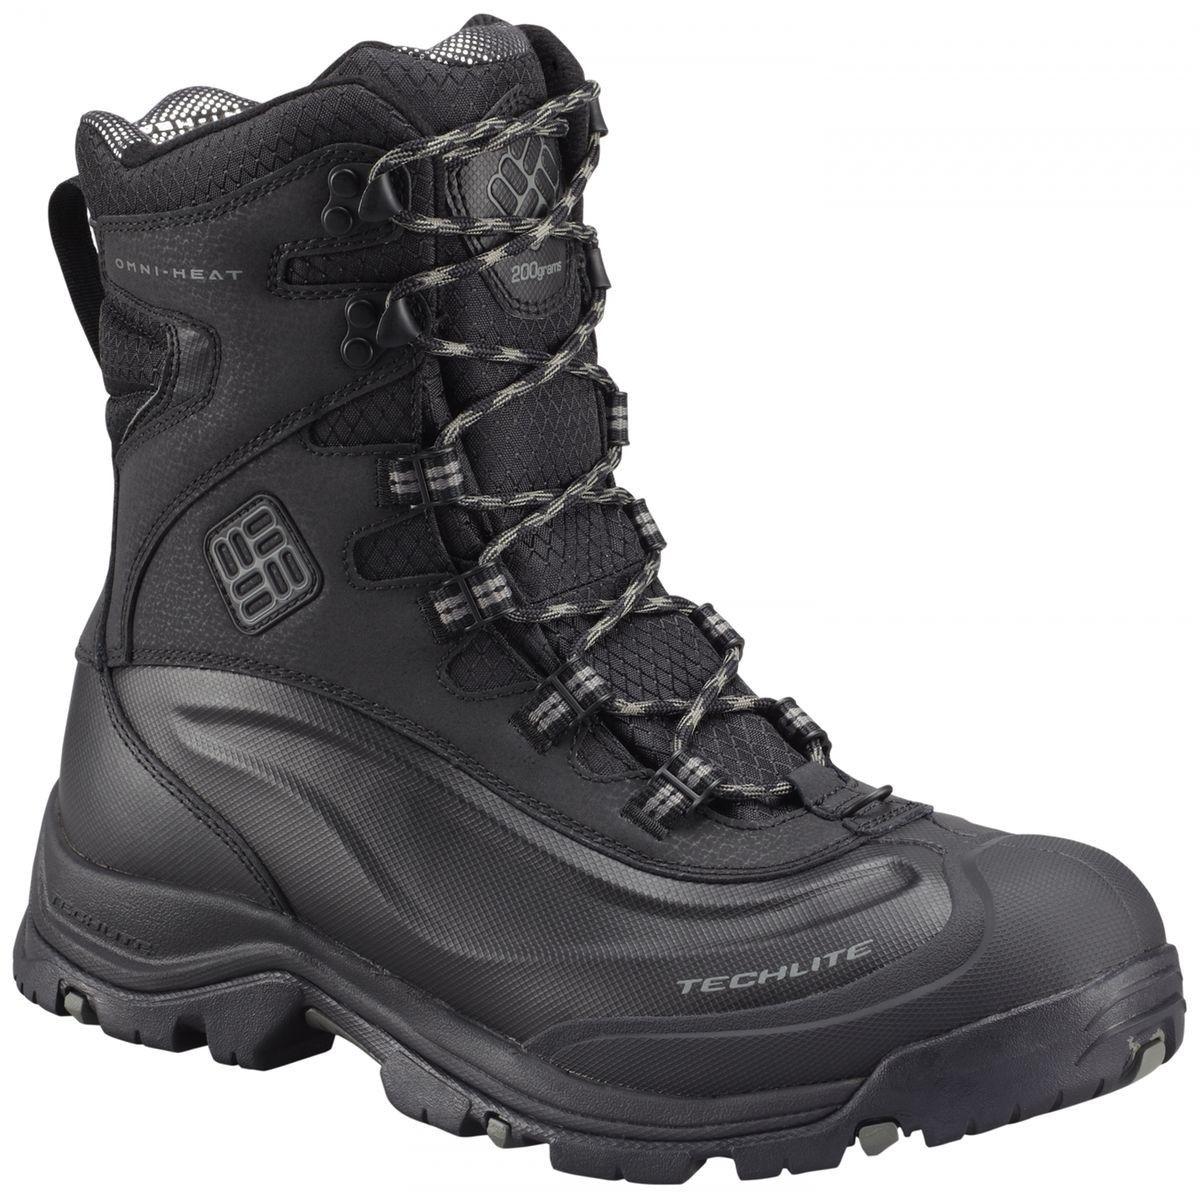 cba26041dbe Bugaboot Plus Iii Boots Omni-heat Men, Black / Charcoal - Taille ...